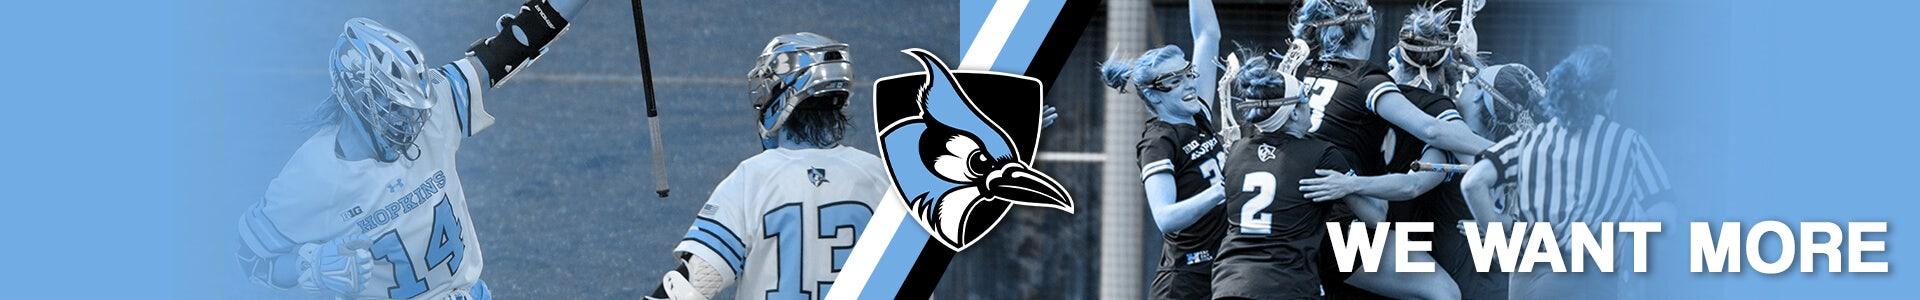 new style e6fcd dbae3 Johns Hopkins Lacrosse Apparel | Lacrosse Unlimited